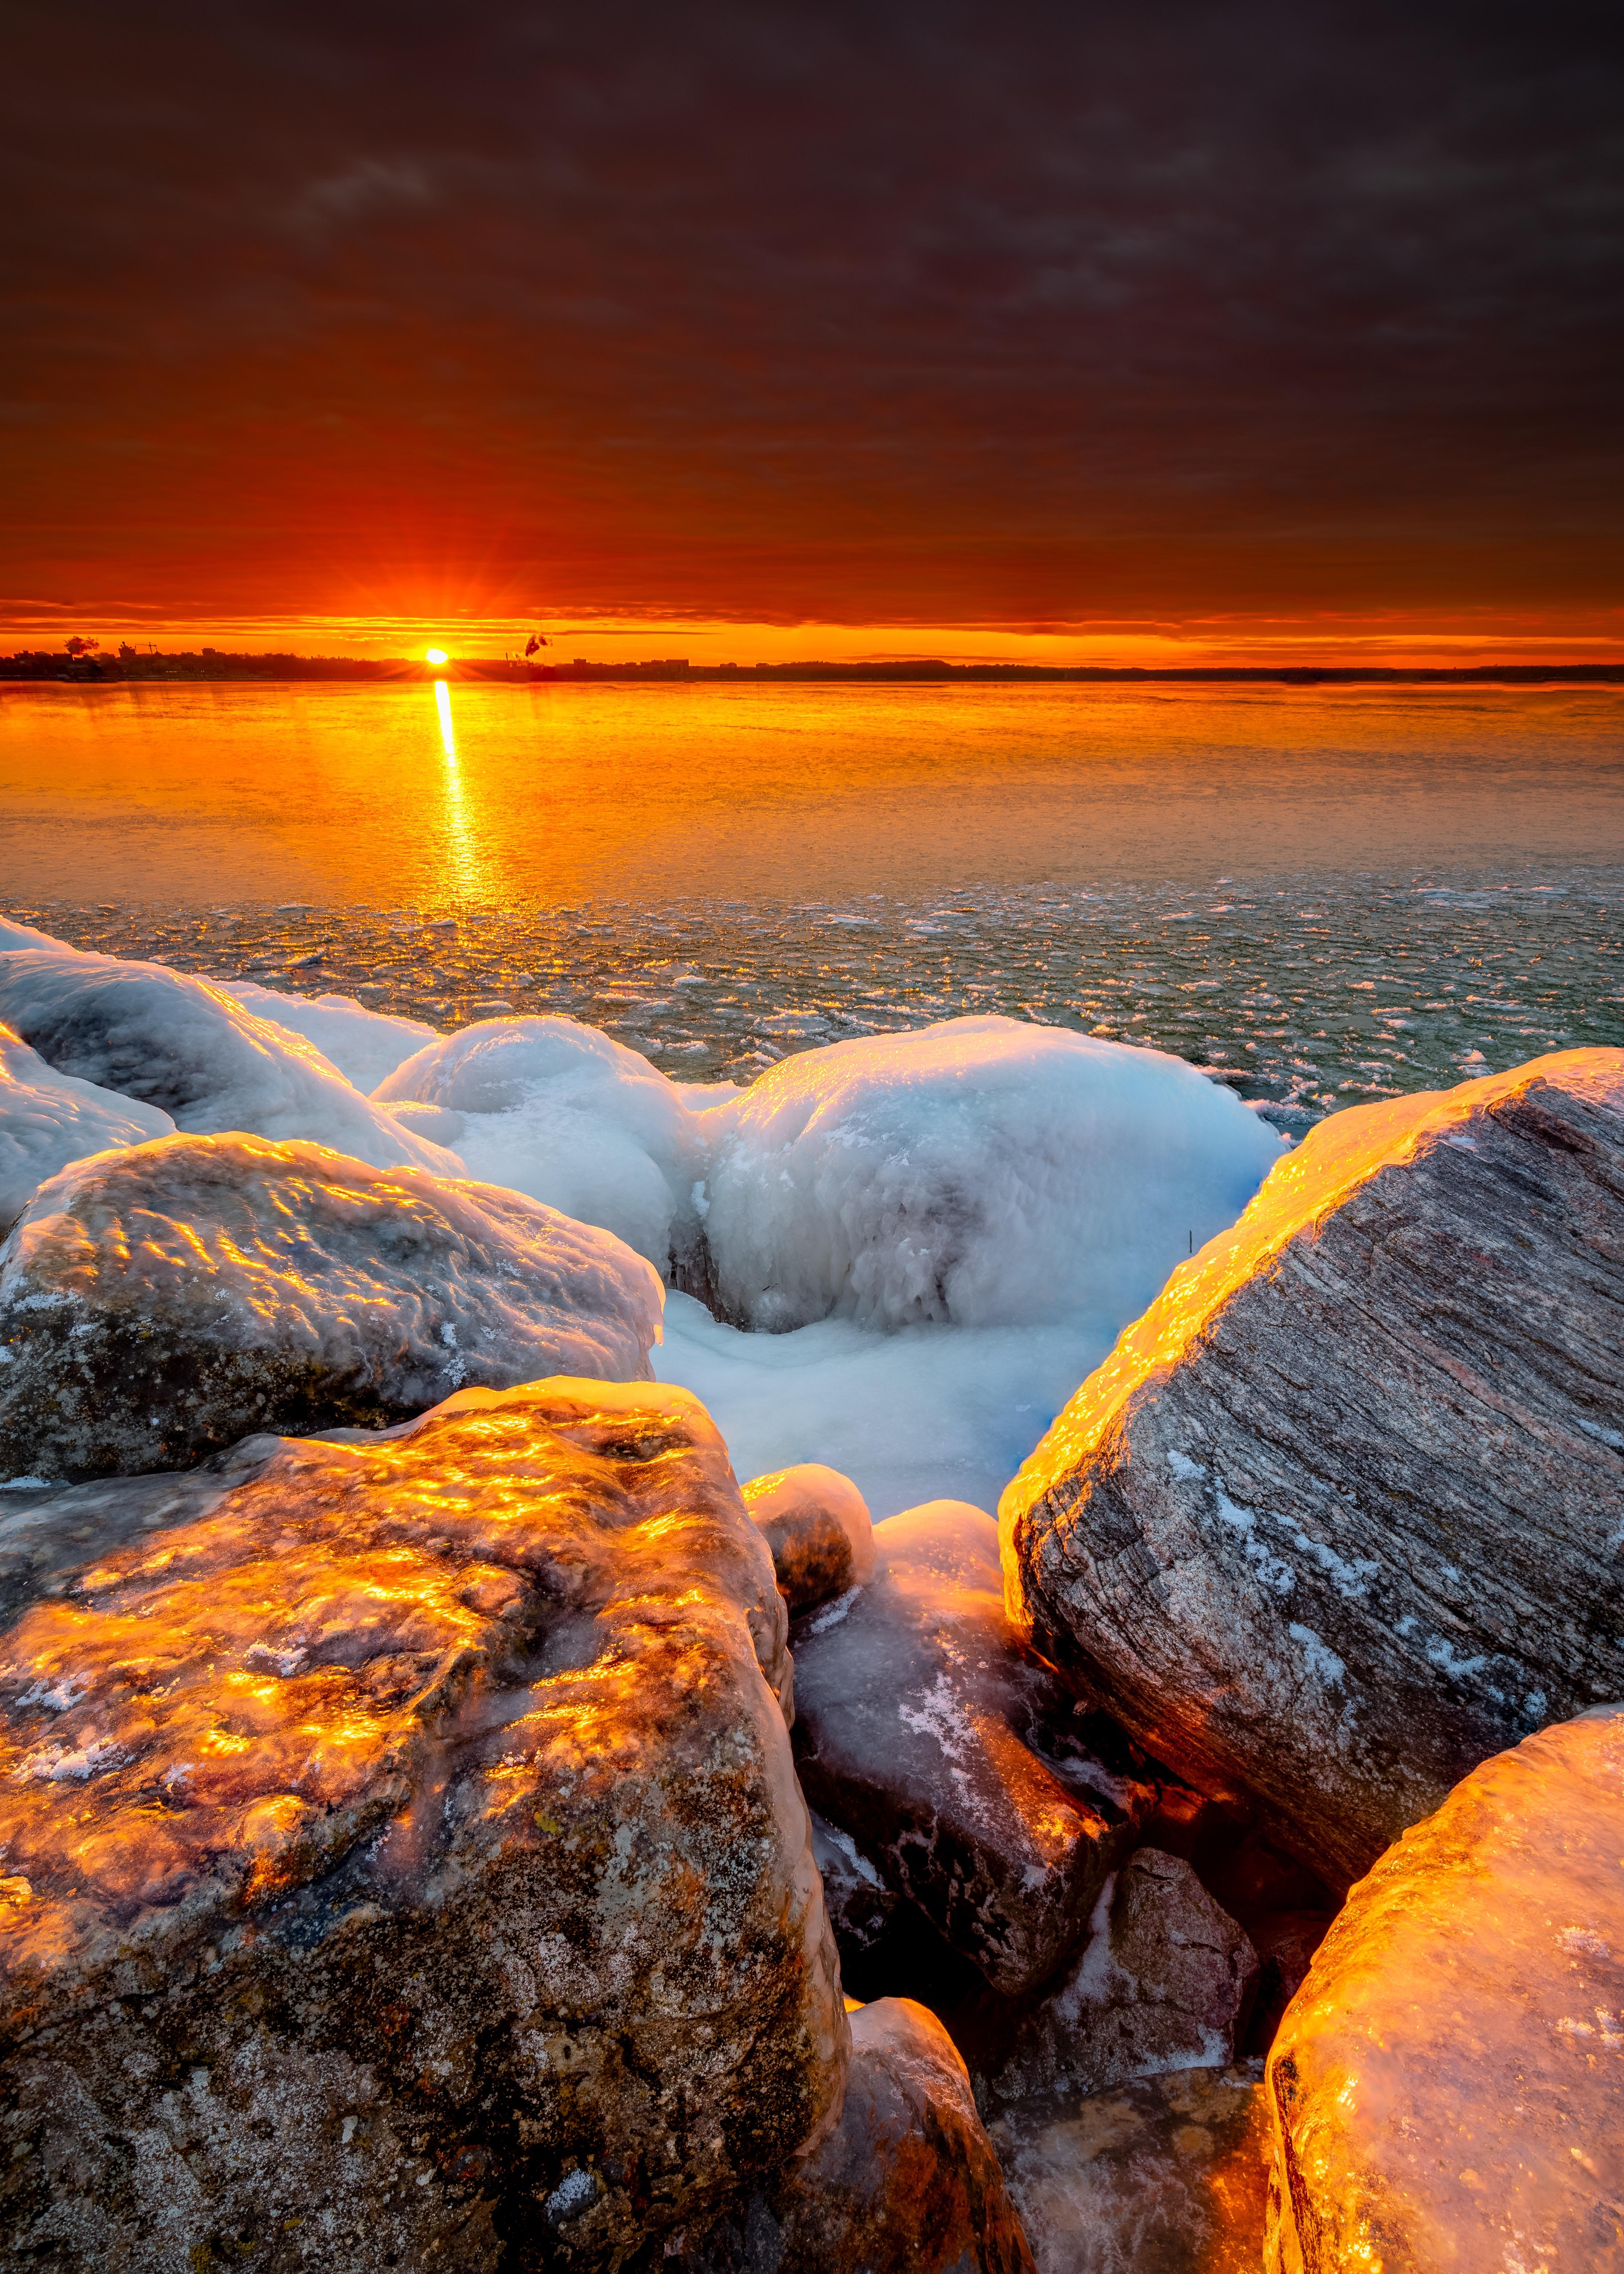 53318 Заставки и Обои Лед на телефон. Скачать Лед, Природа, Закат, Камни, Море, Берег картинки бесплатно